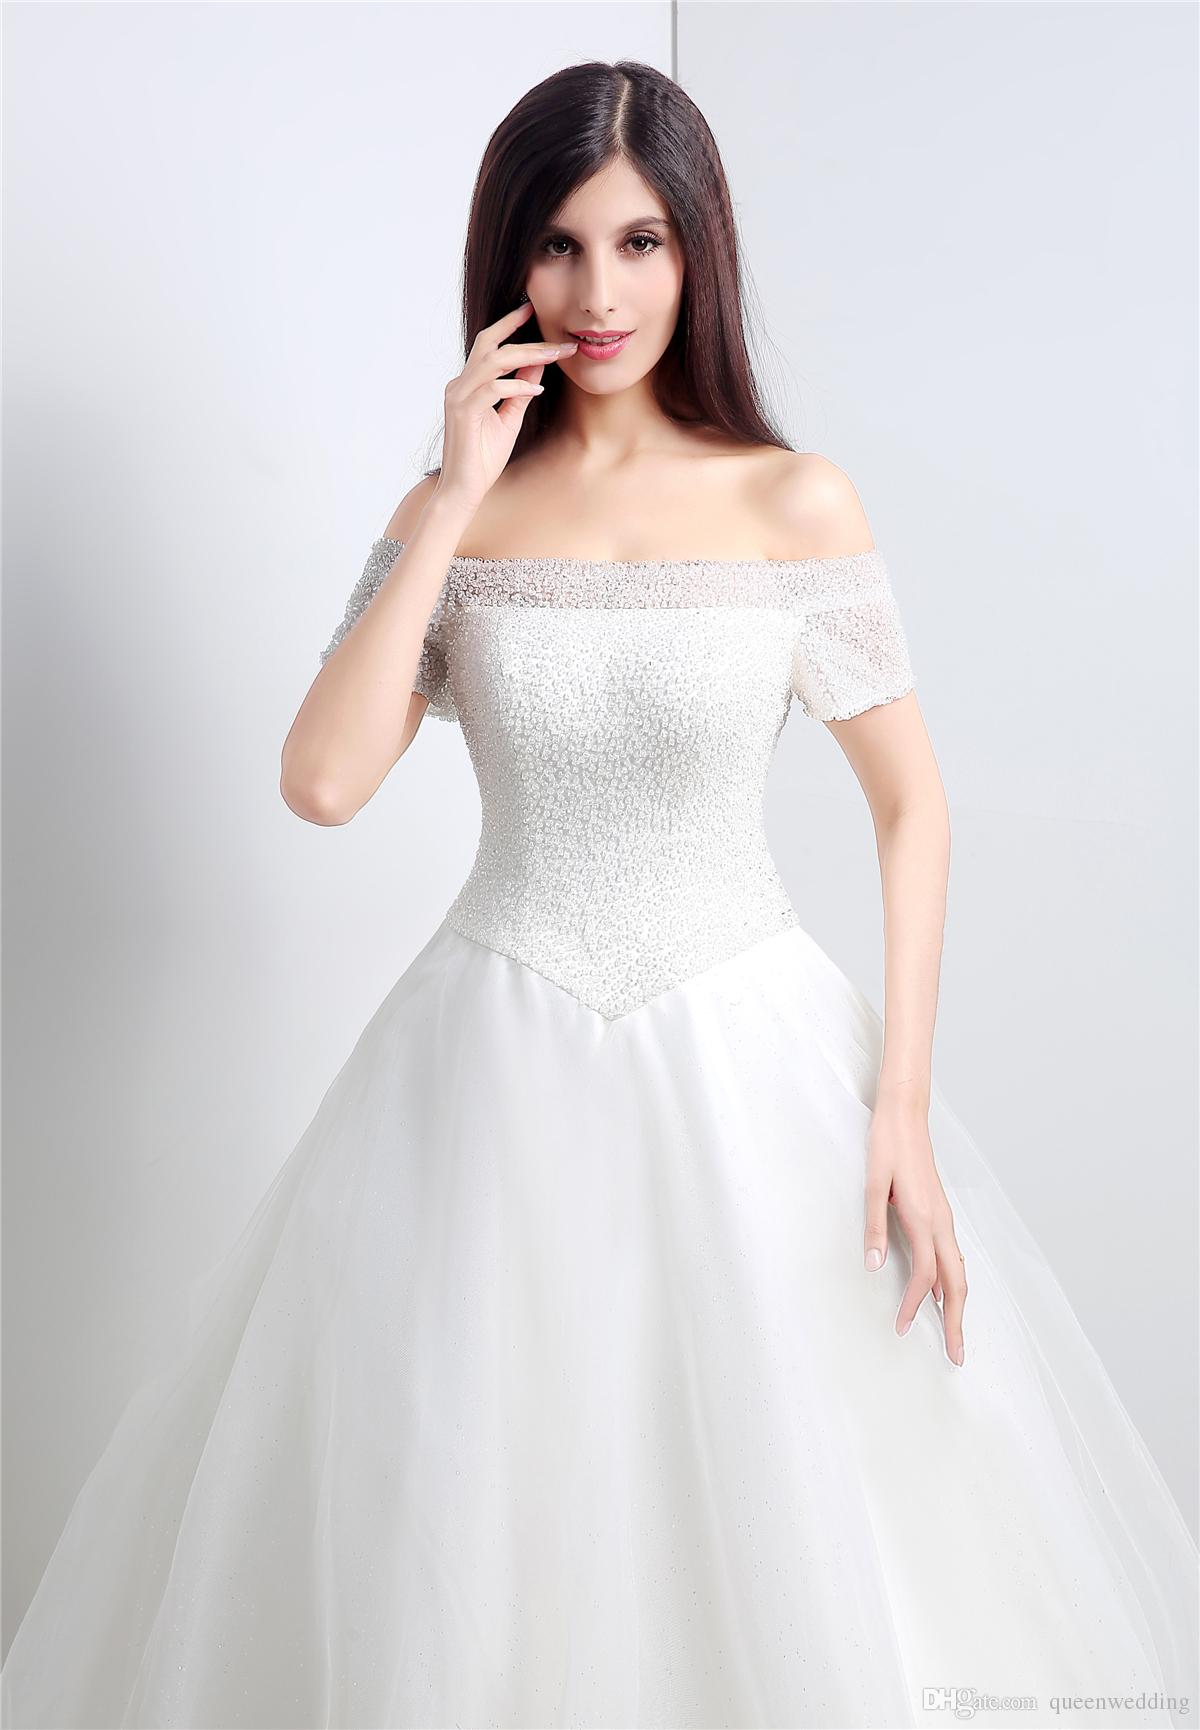 Romantic Long 2015 Wedding Dresses Boat Neck Ball Gown